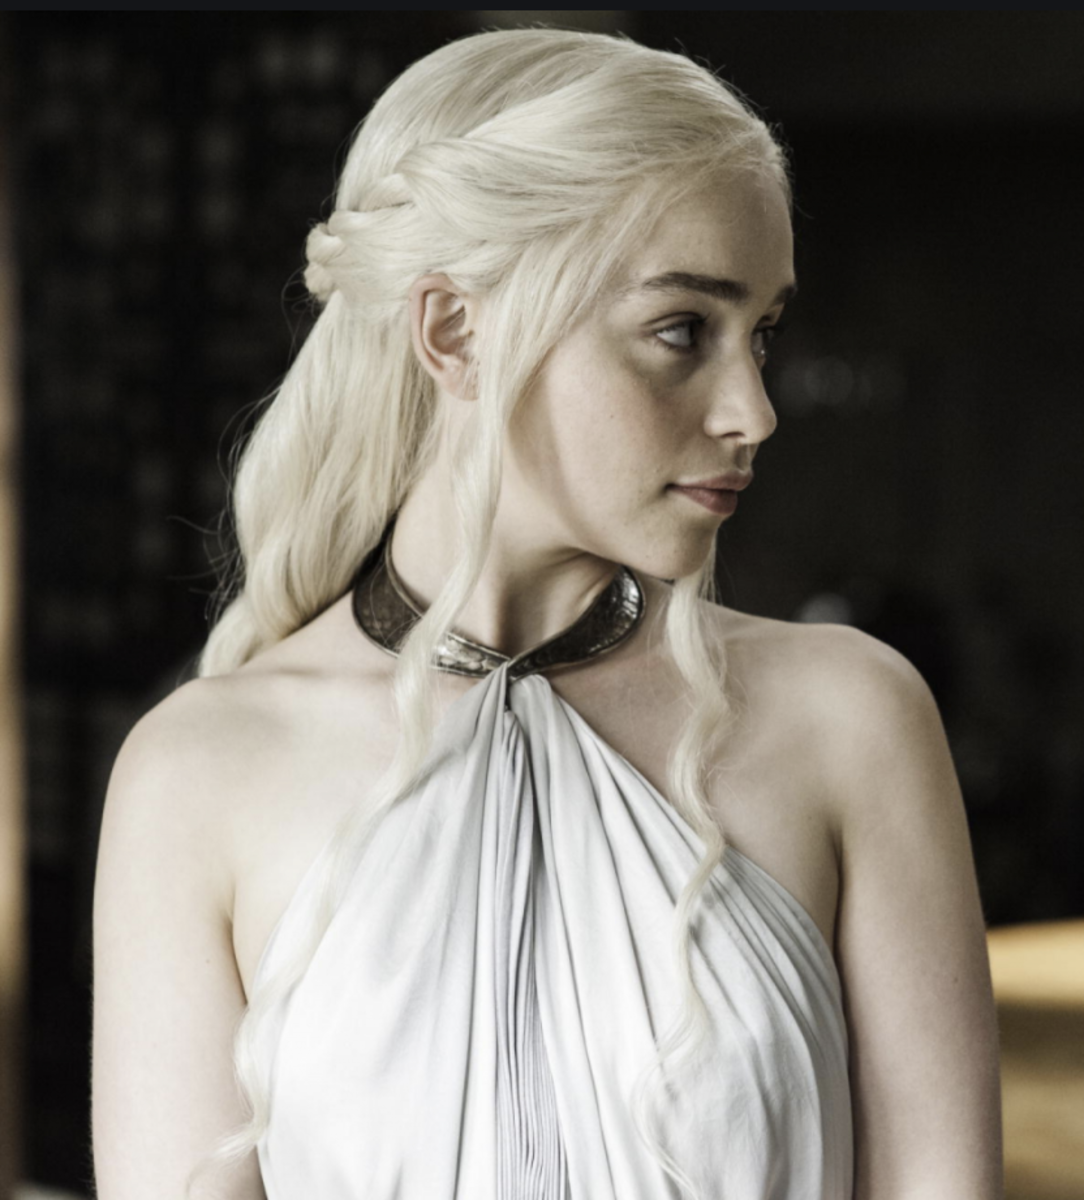 Emilia Clarke as Daenerys Targaryen, Game of Thrones Season 4